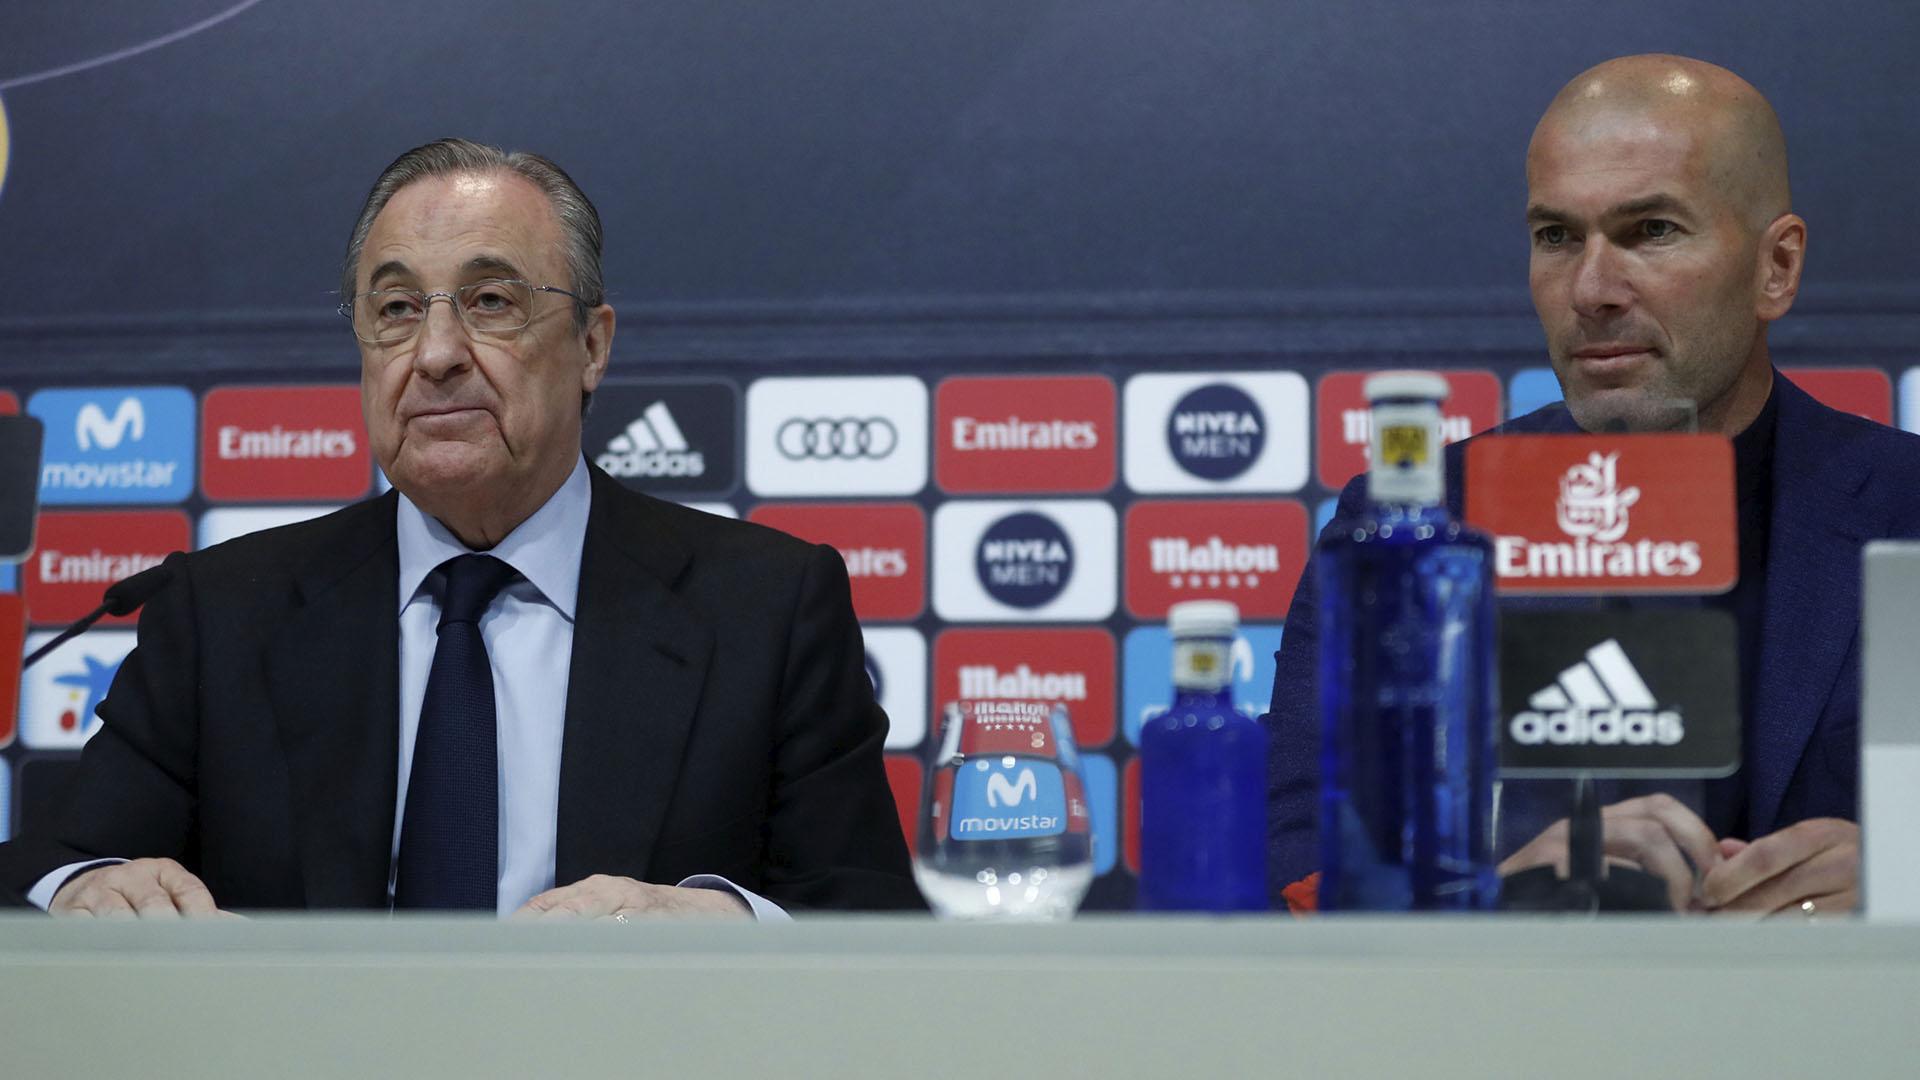 (Reuters) Zidane y Florentino Pérez llegaron a un acuerdo